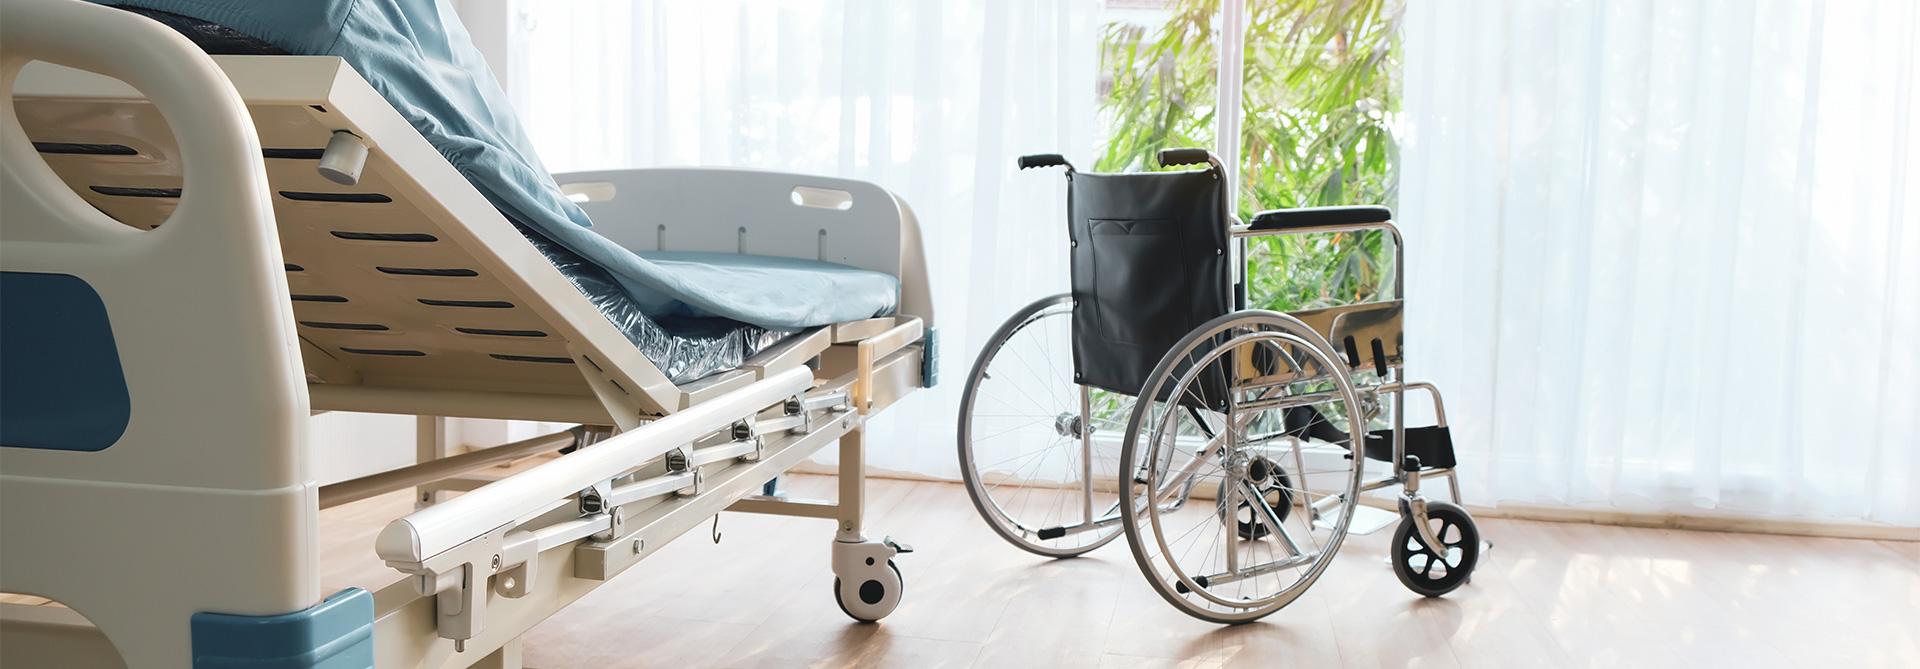 Sanitätshaus Hamel Startseite Slide 4 Rollstuhl